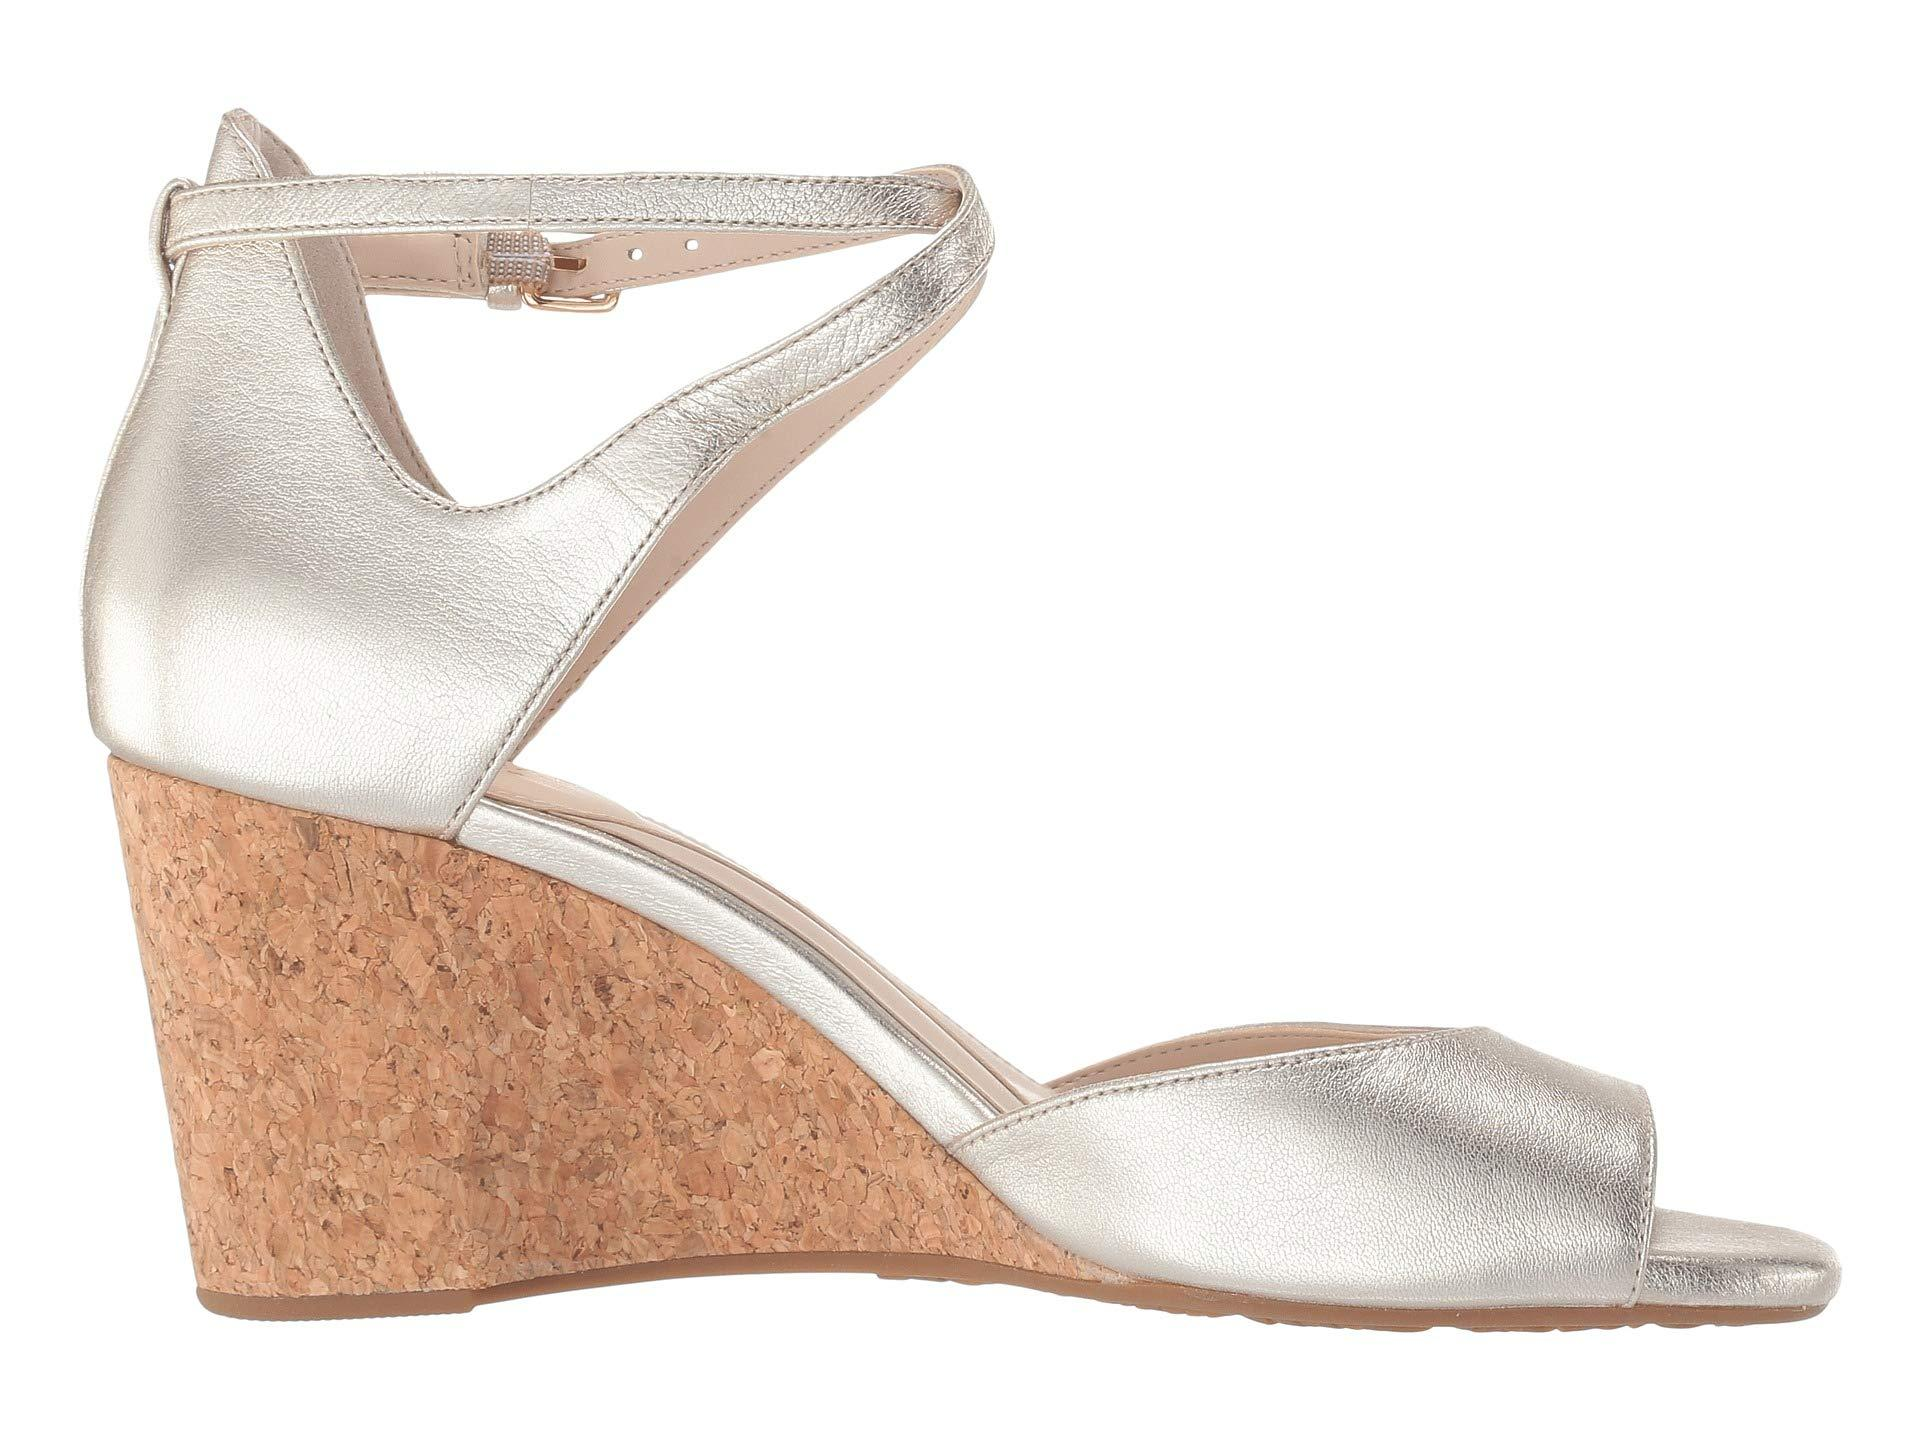 986d82f0bb90 Cole Haan Sadie Grand Open Toe Wedge Sandal (marine Blue Nubuck) Women's  Shoes in Metallic - Lyst